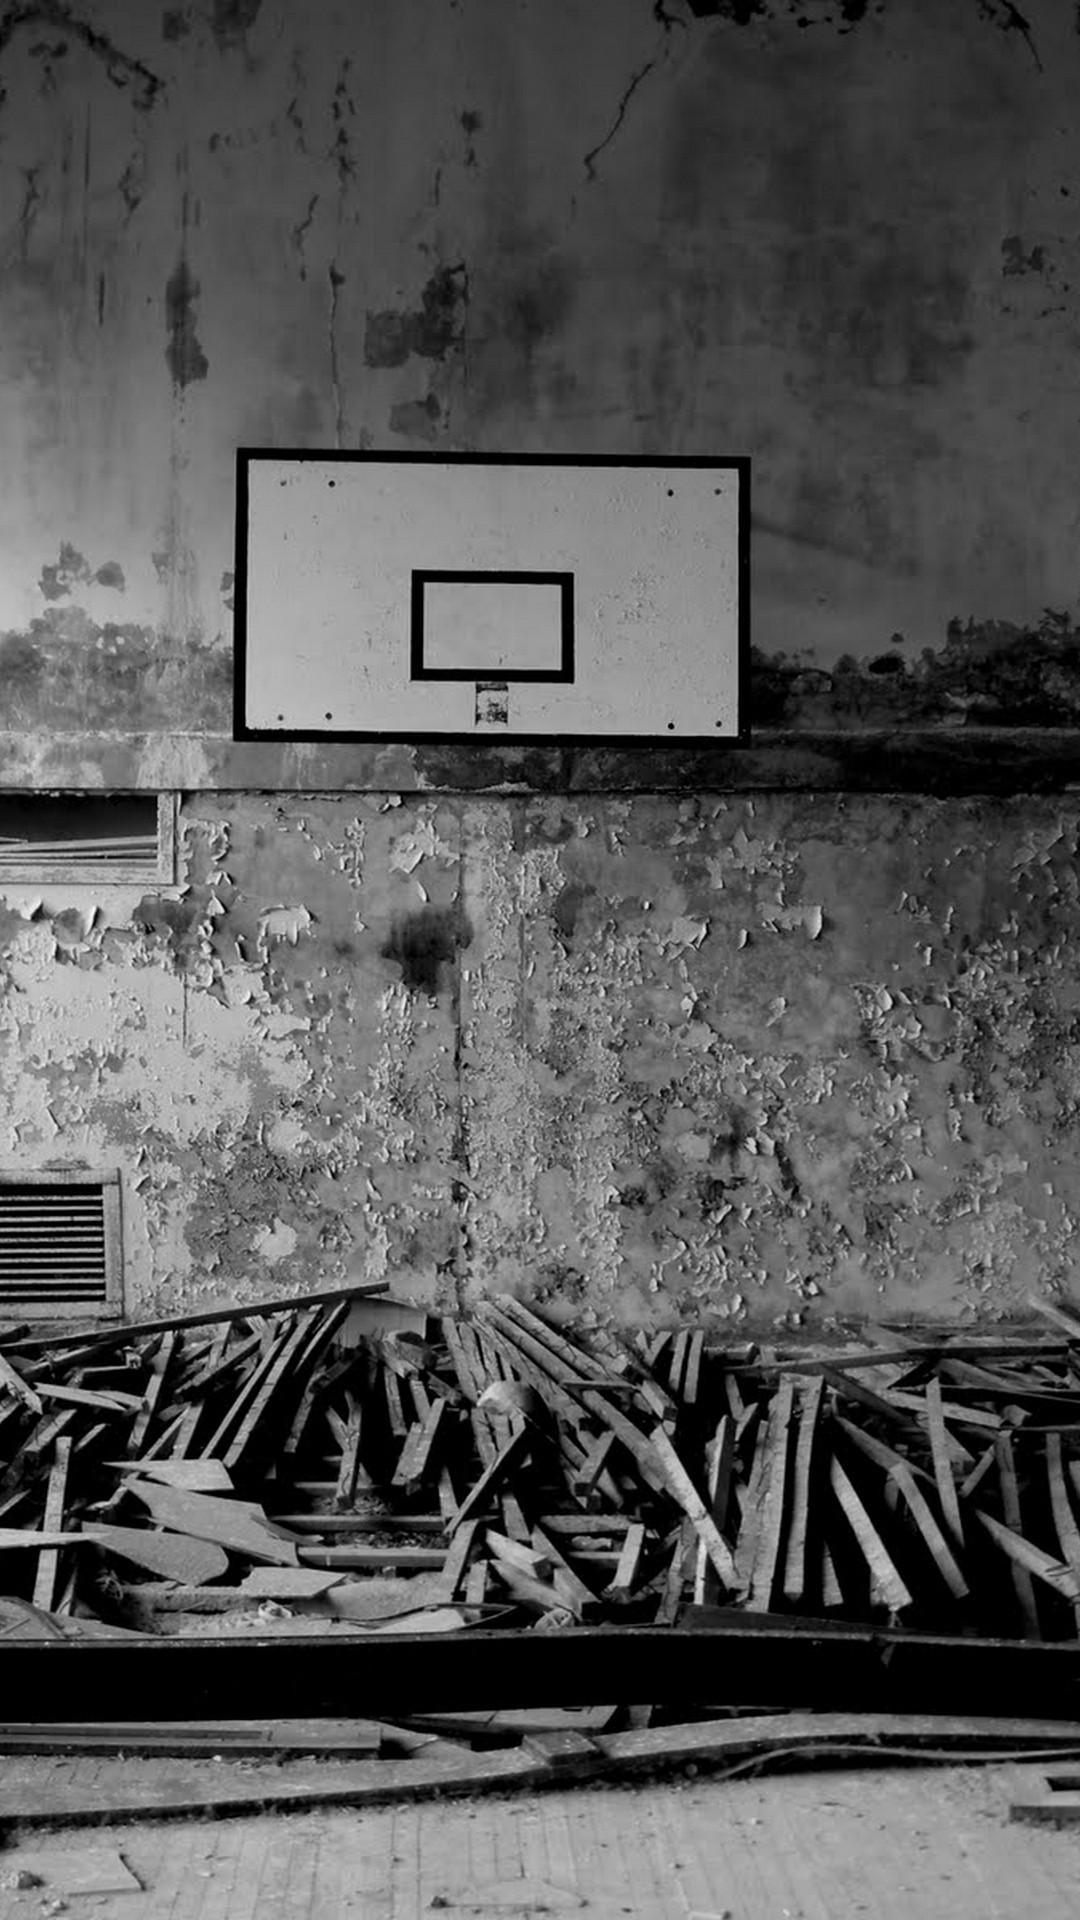 Free Download Nba Iphone 7 Plus Wallpaper 2019 Basketball